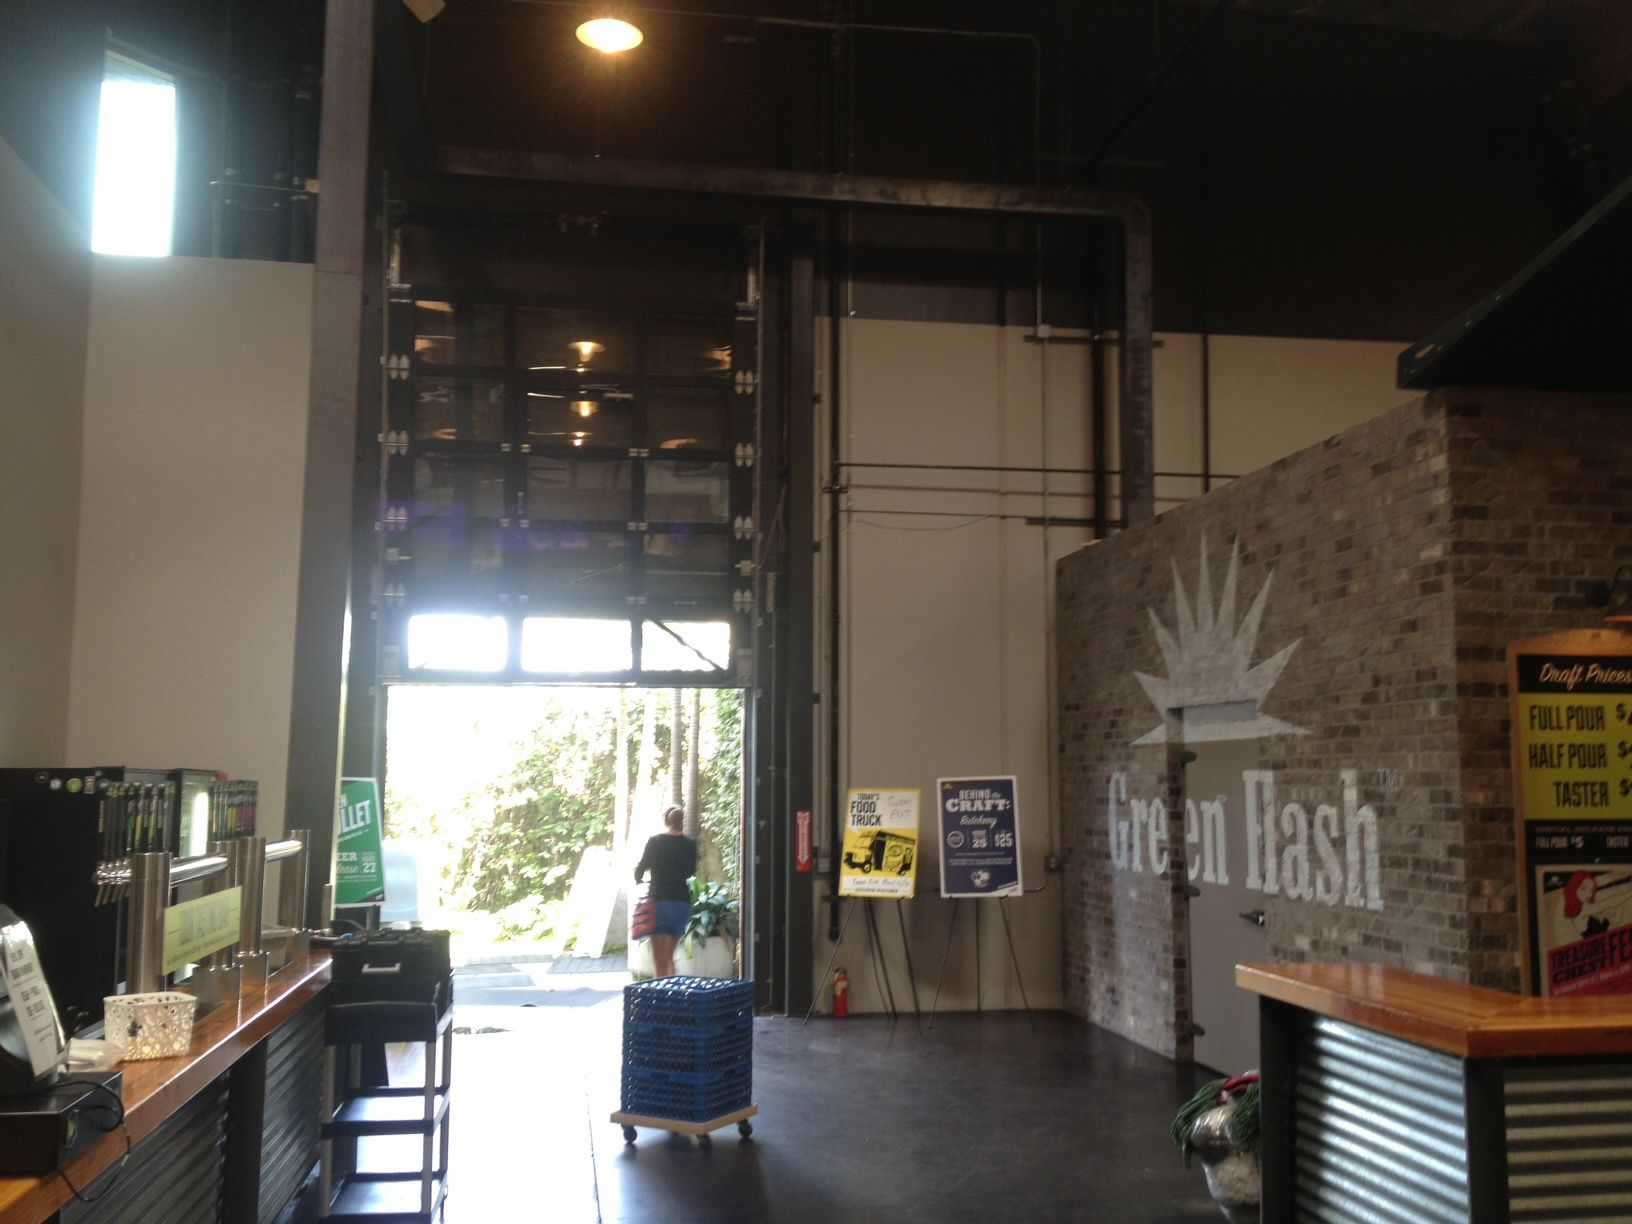 Glass garage doors restaurant - Green Flash Brewery In California With Welded Arm R Lite Glass Garage Door And